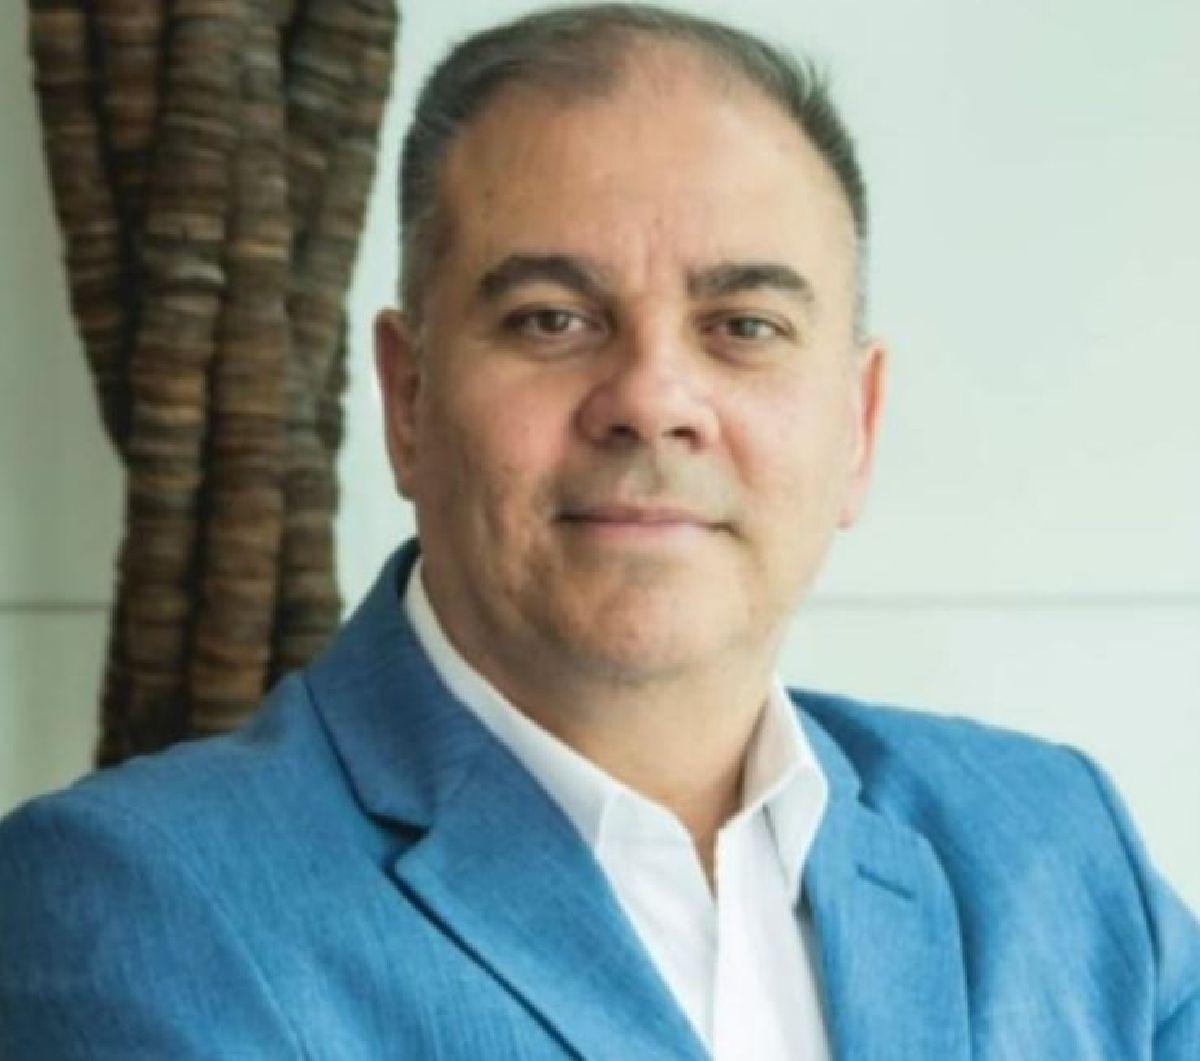 LUIZ ADLEN, EXECUTIVO DO MERCADO DE TURISMO HÁ MAIS DE 30 ANOS, PASSA A INTEGRAR O TIME DE GESTORES DA REDE SAN JUAN HOTÉIS.